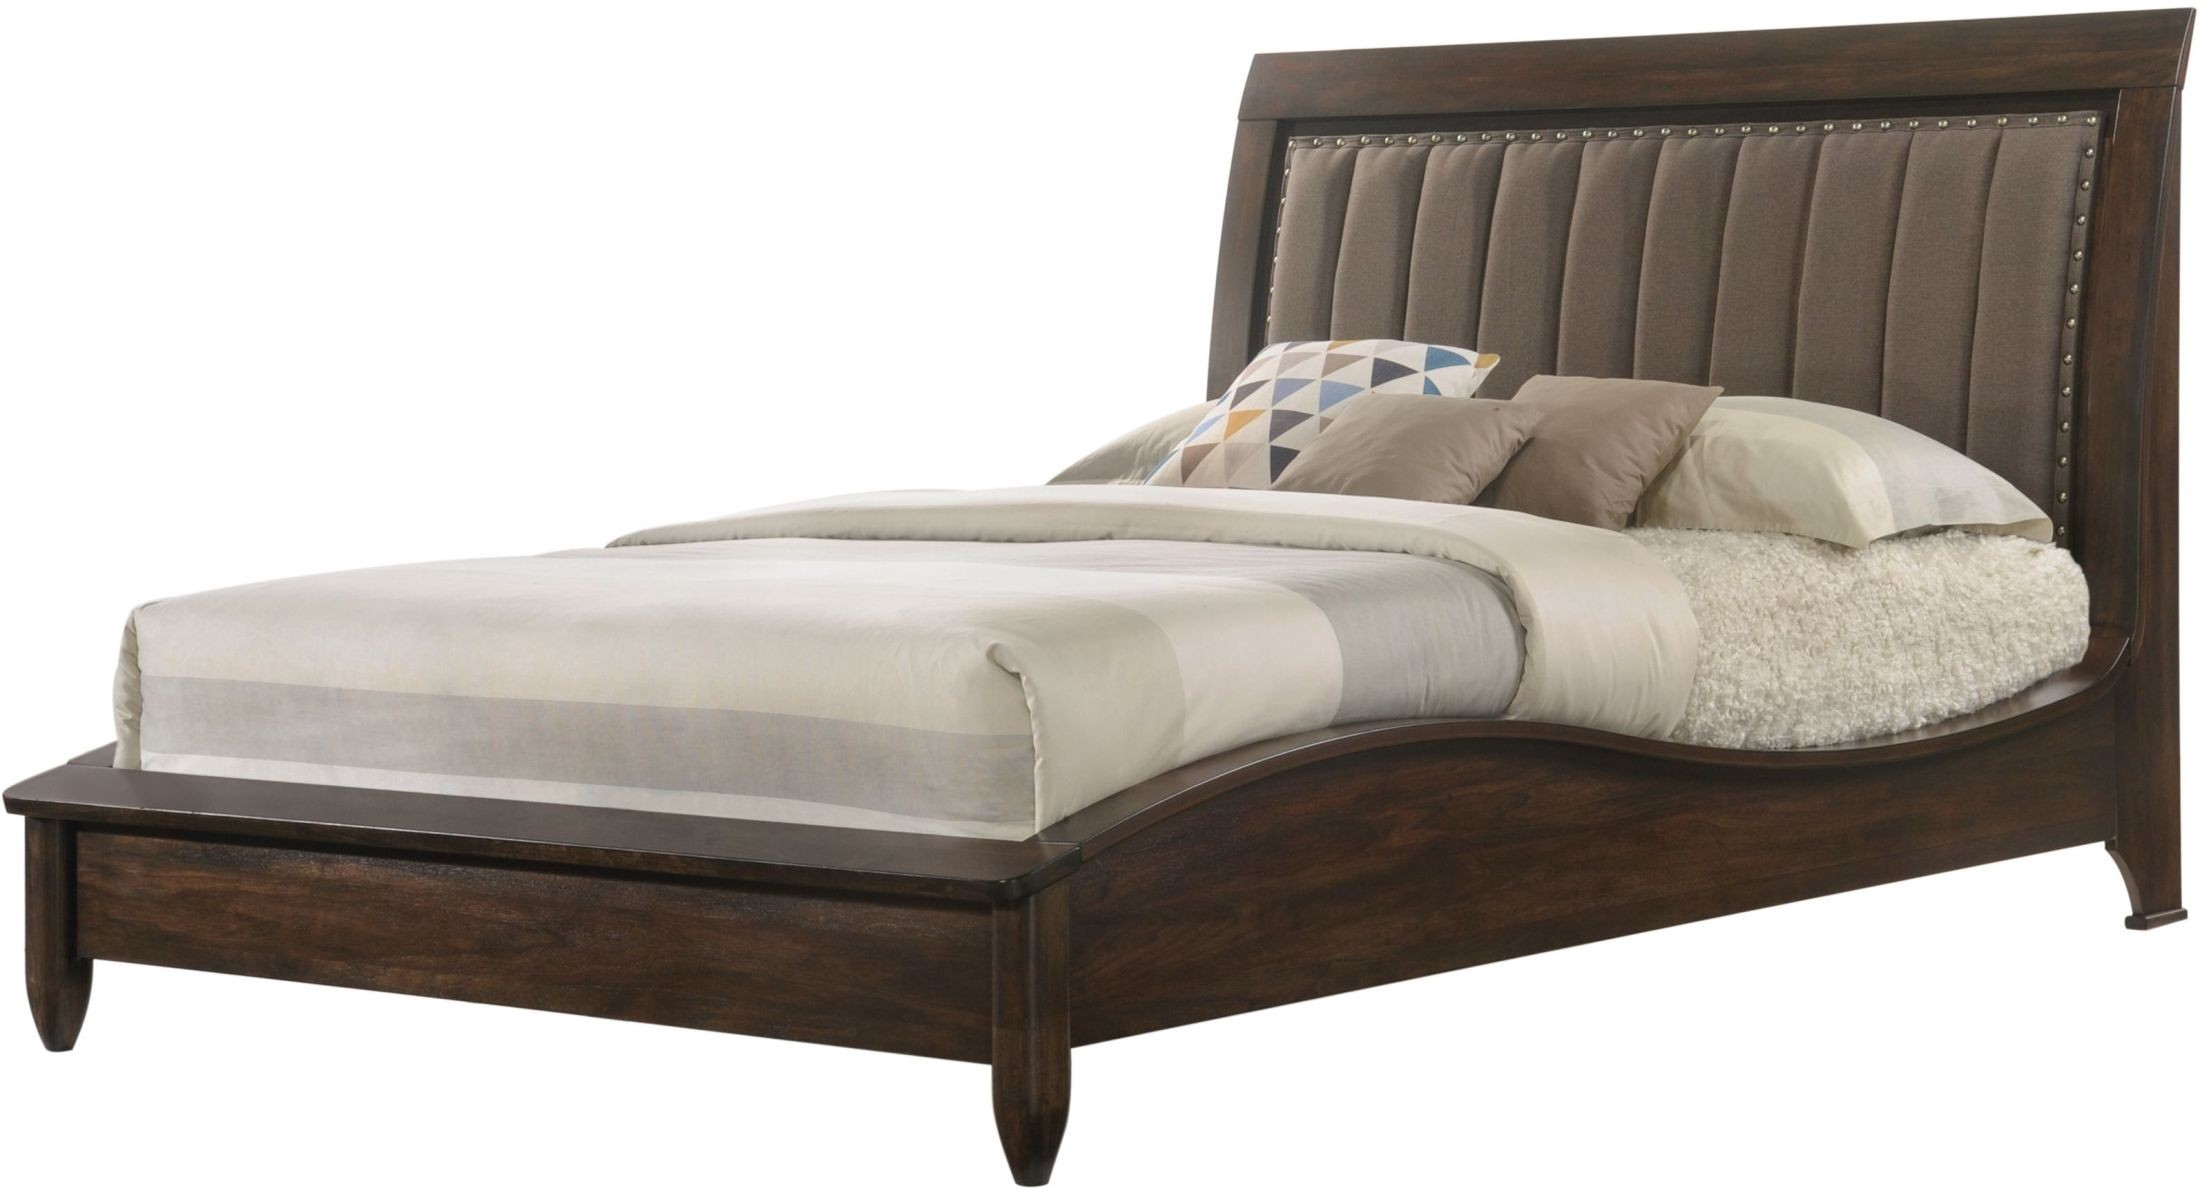 Windsong Walnut Cal King Upholstered Platform Bed From